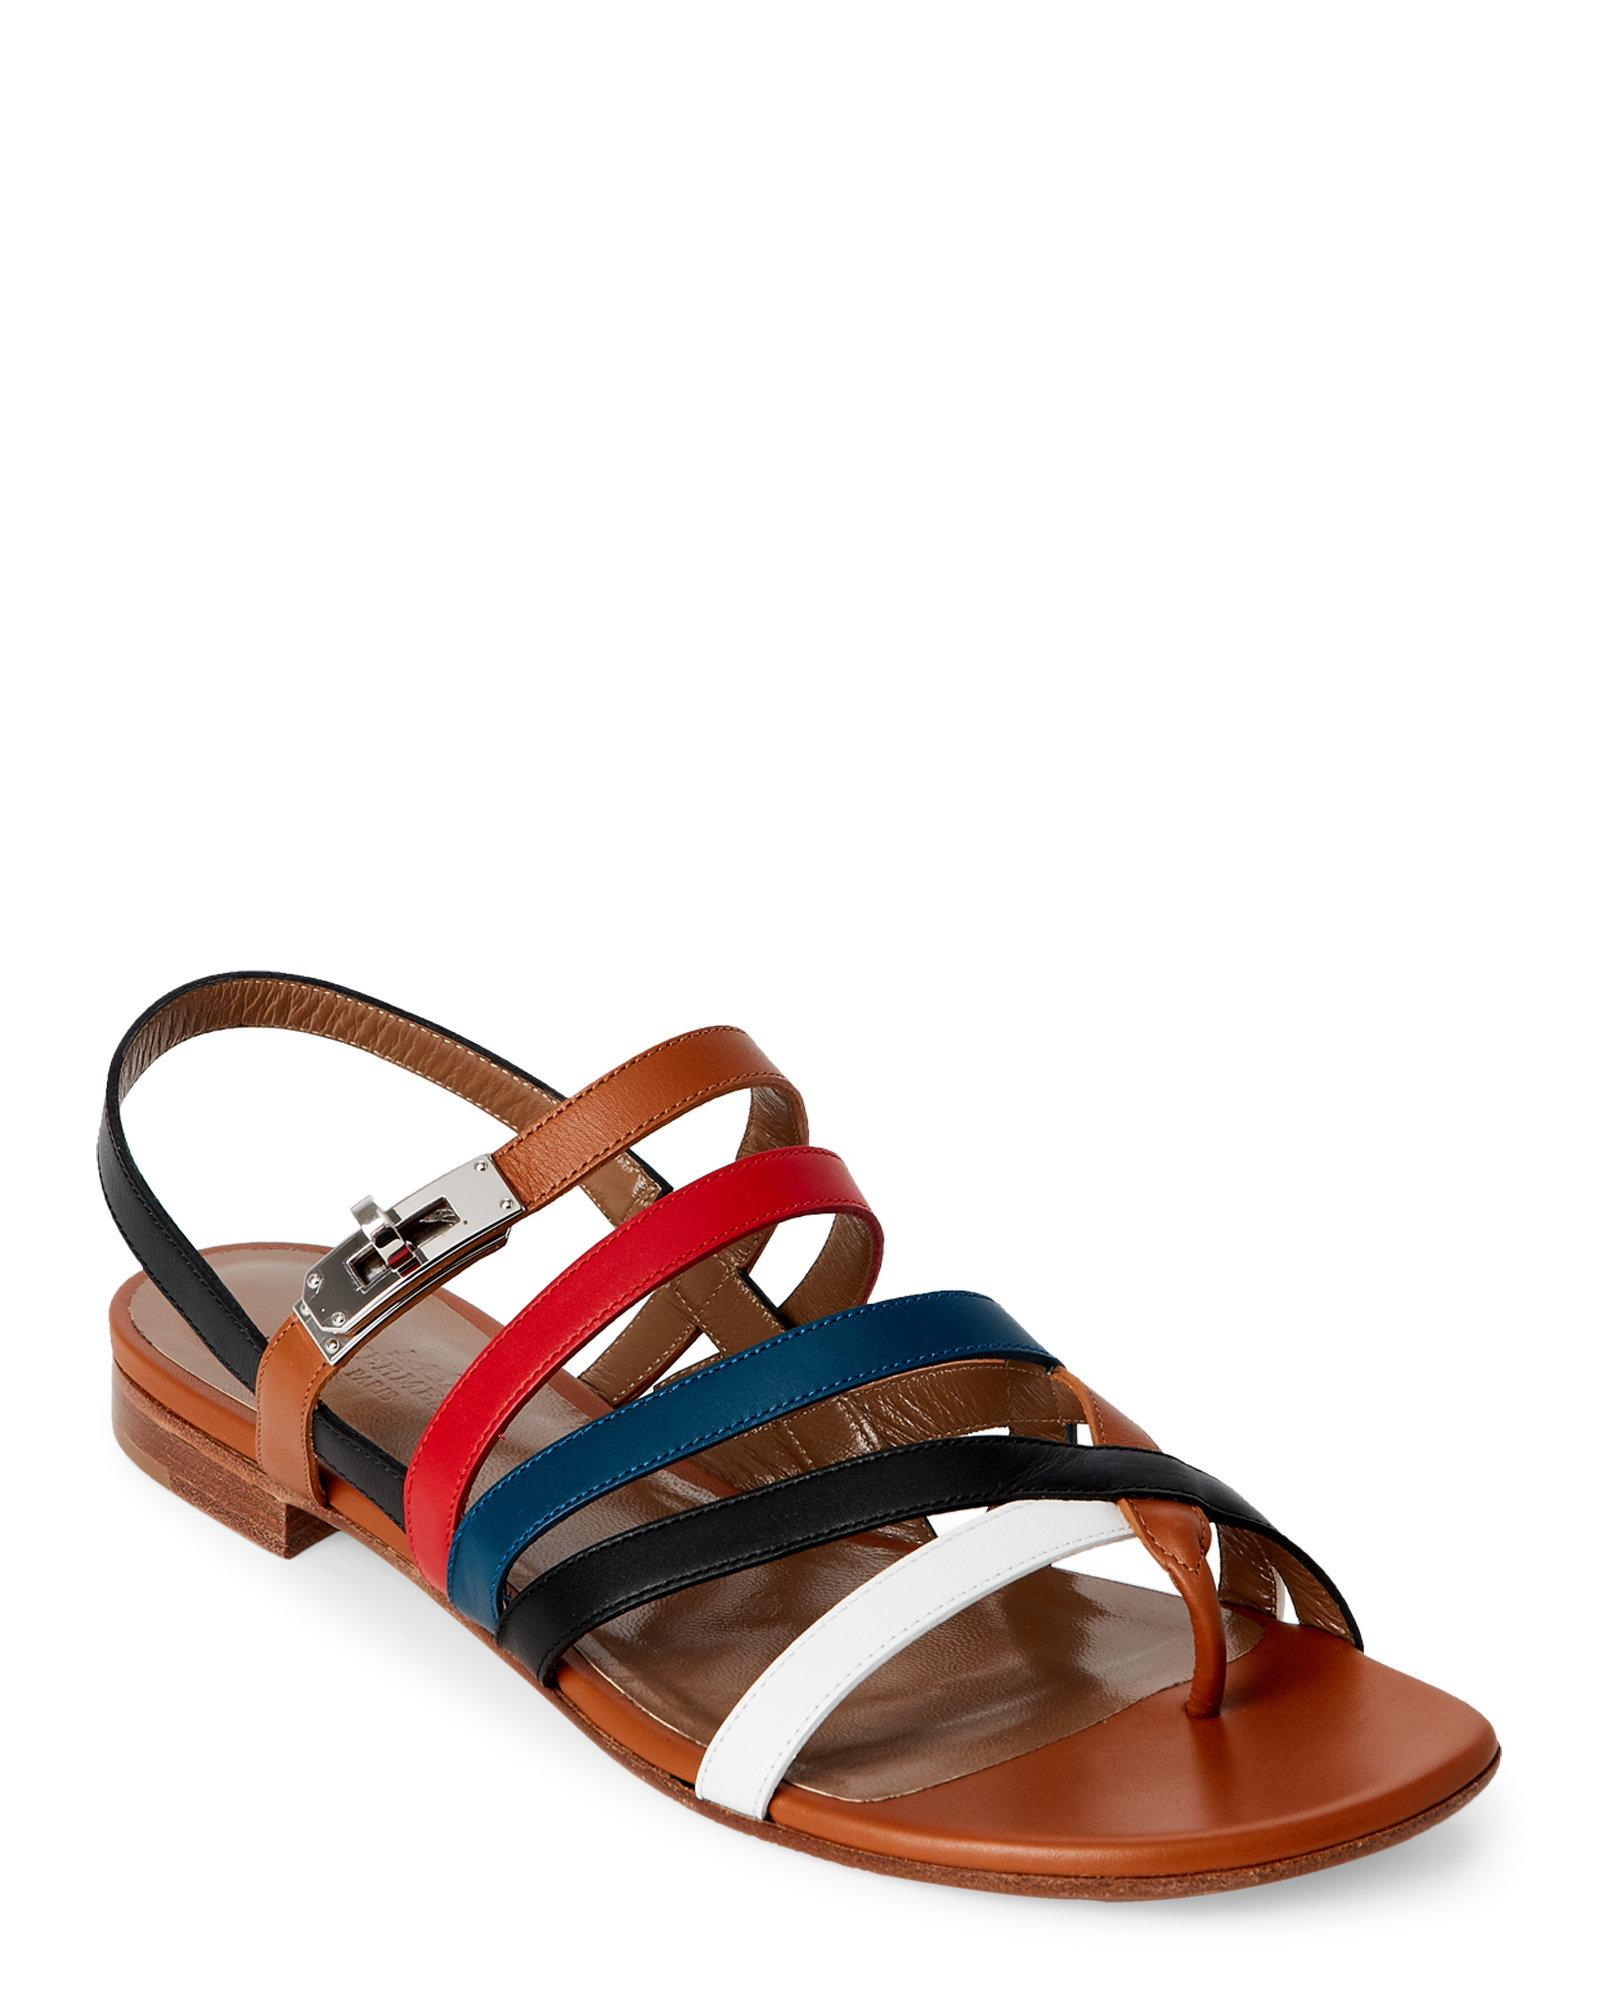 0775078cb7b0 Lyst - Hermès Multicolor Marine Strappy Slingback Sandals